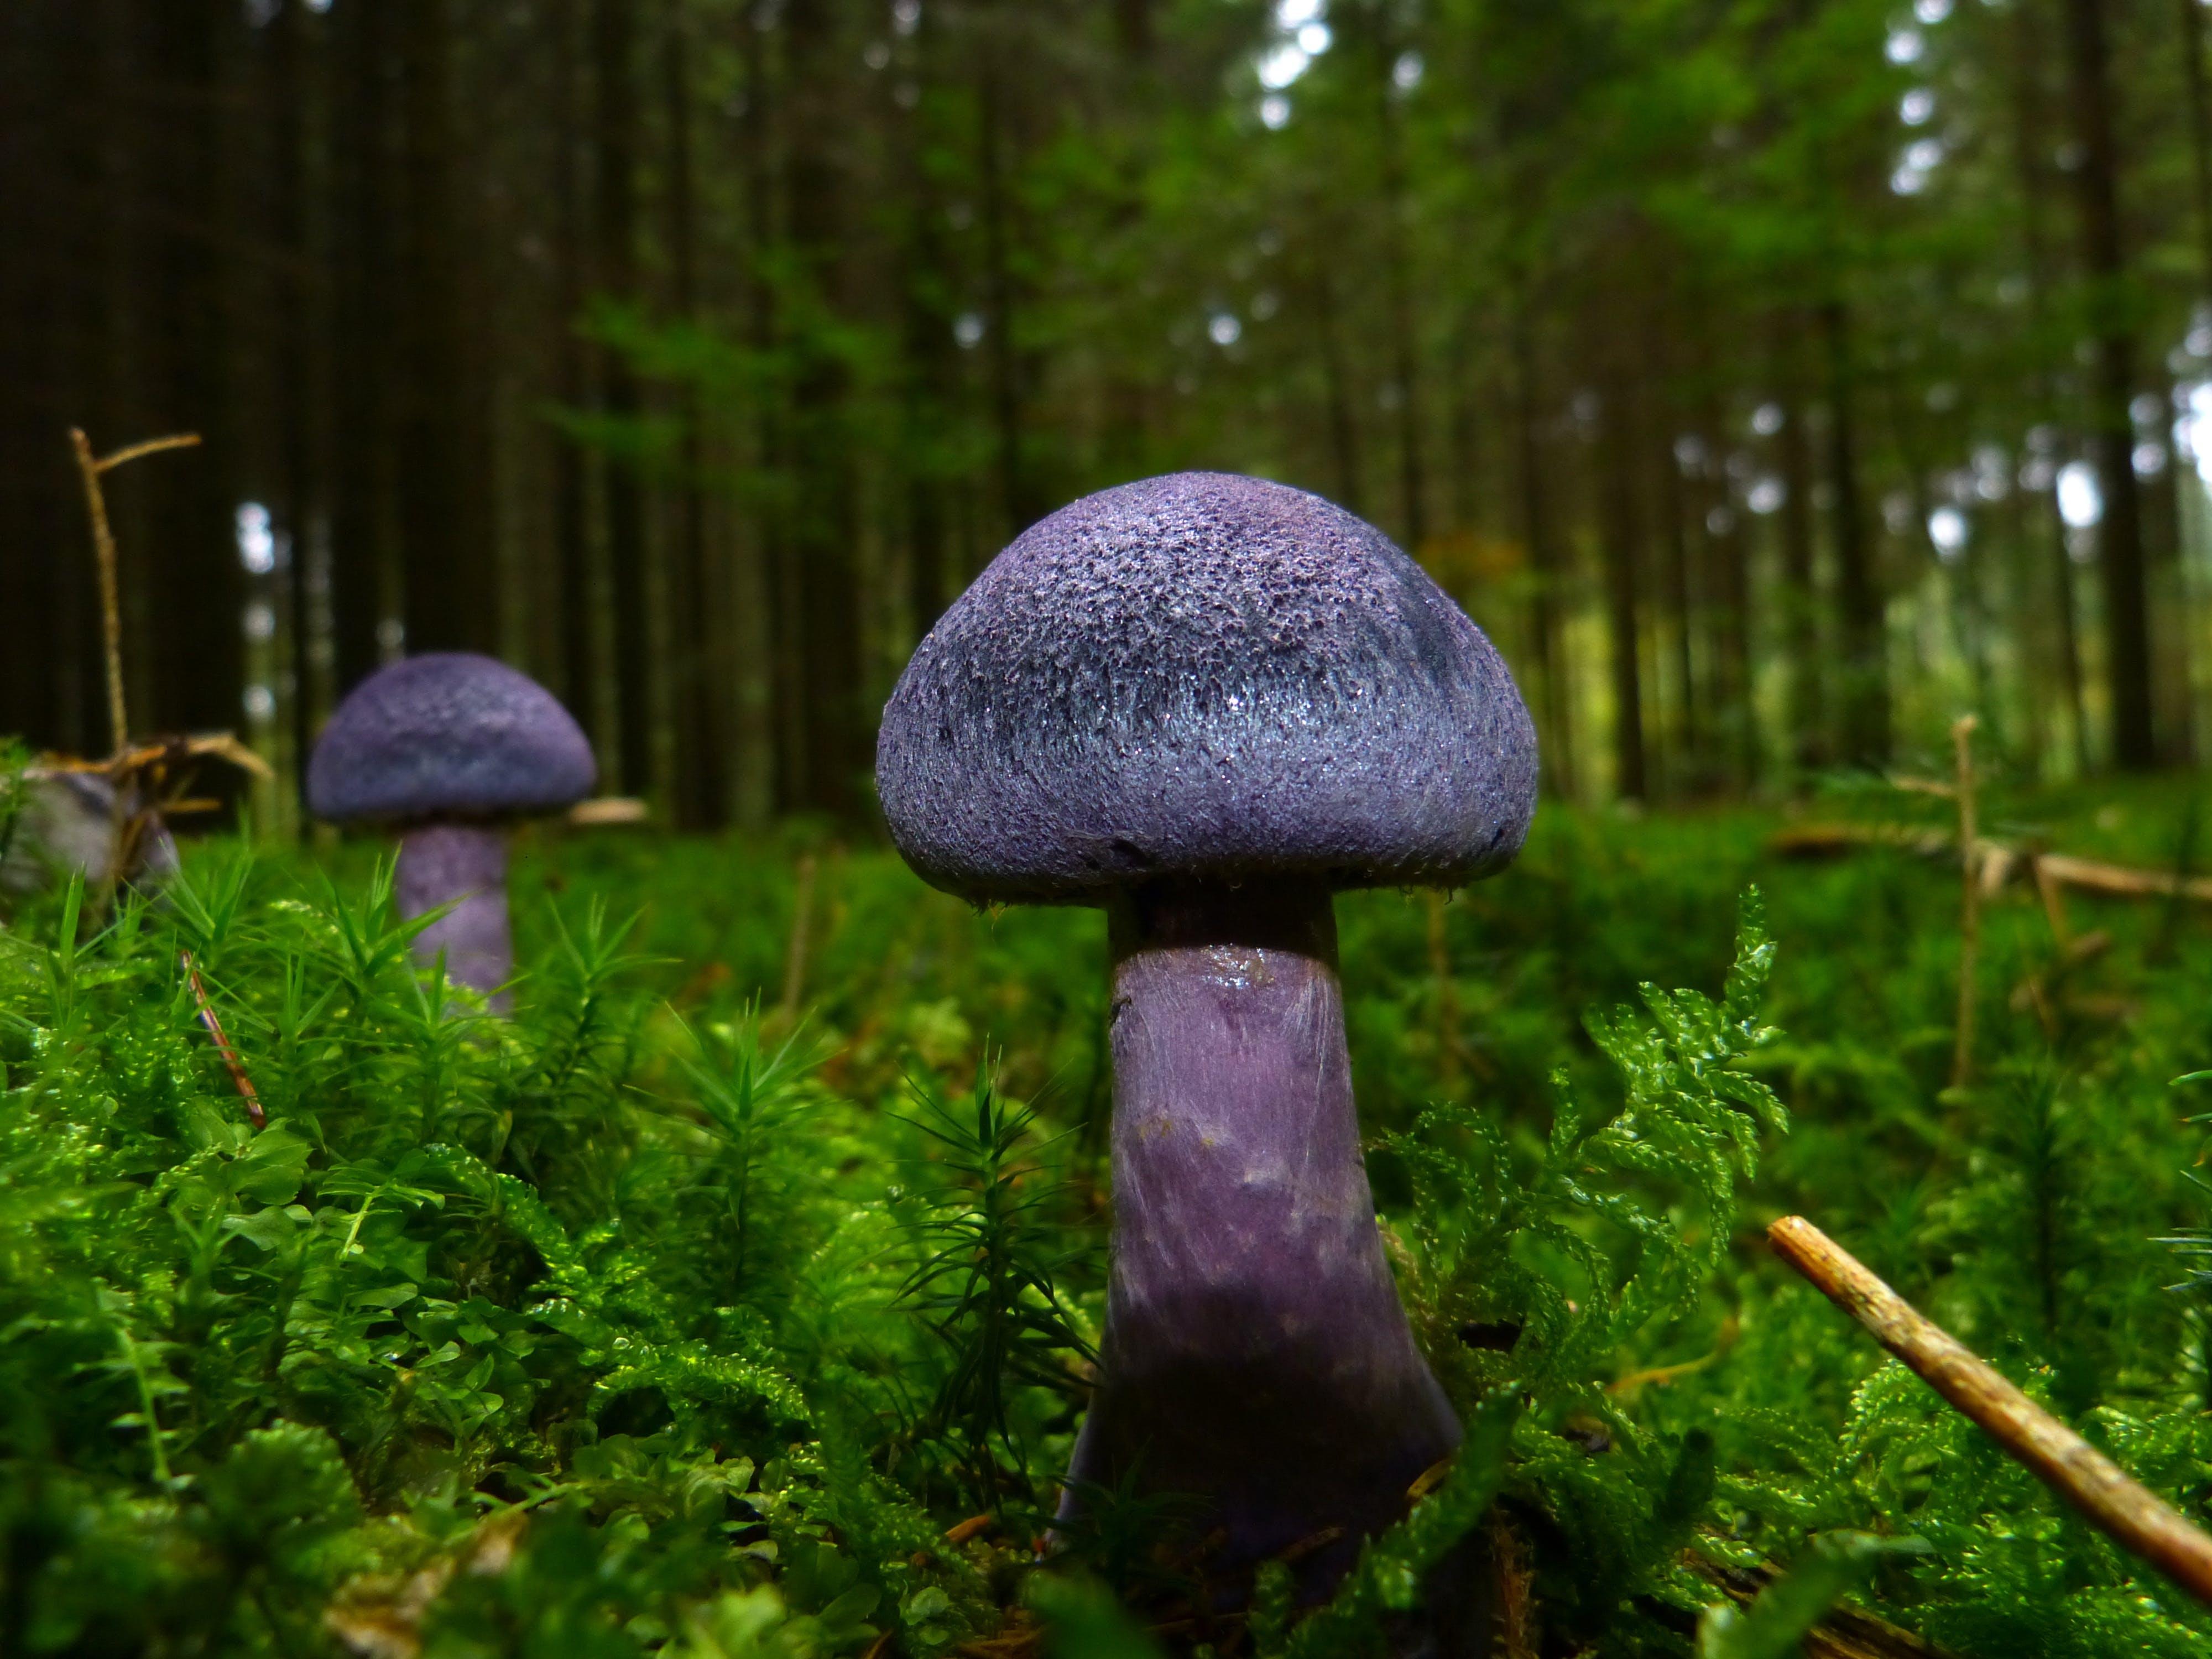 Purple Mushrooms on Green Field